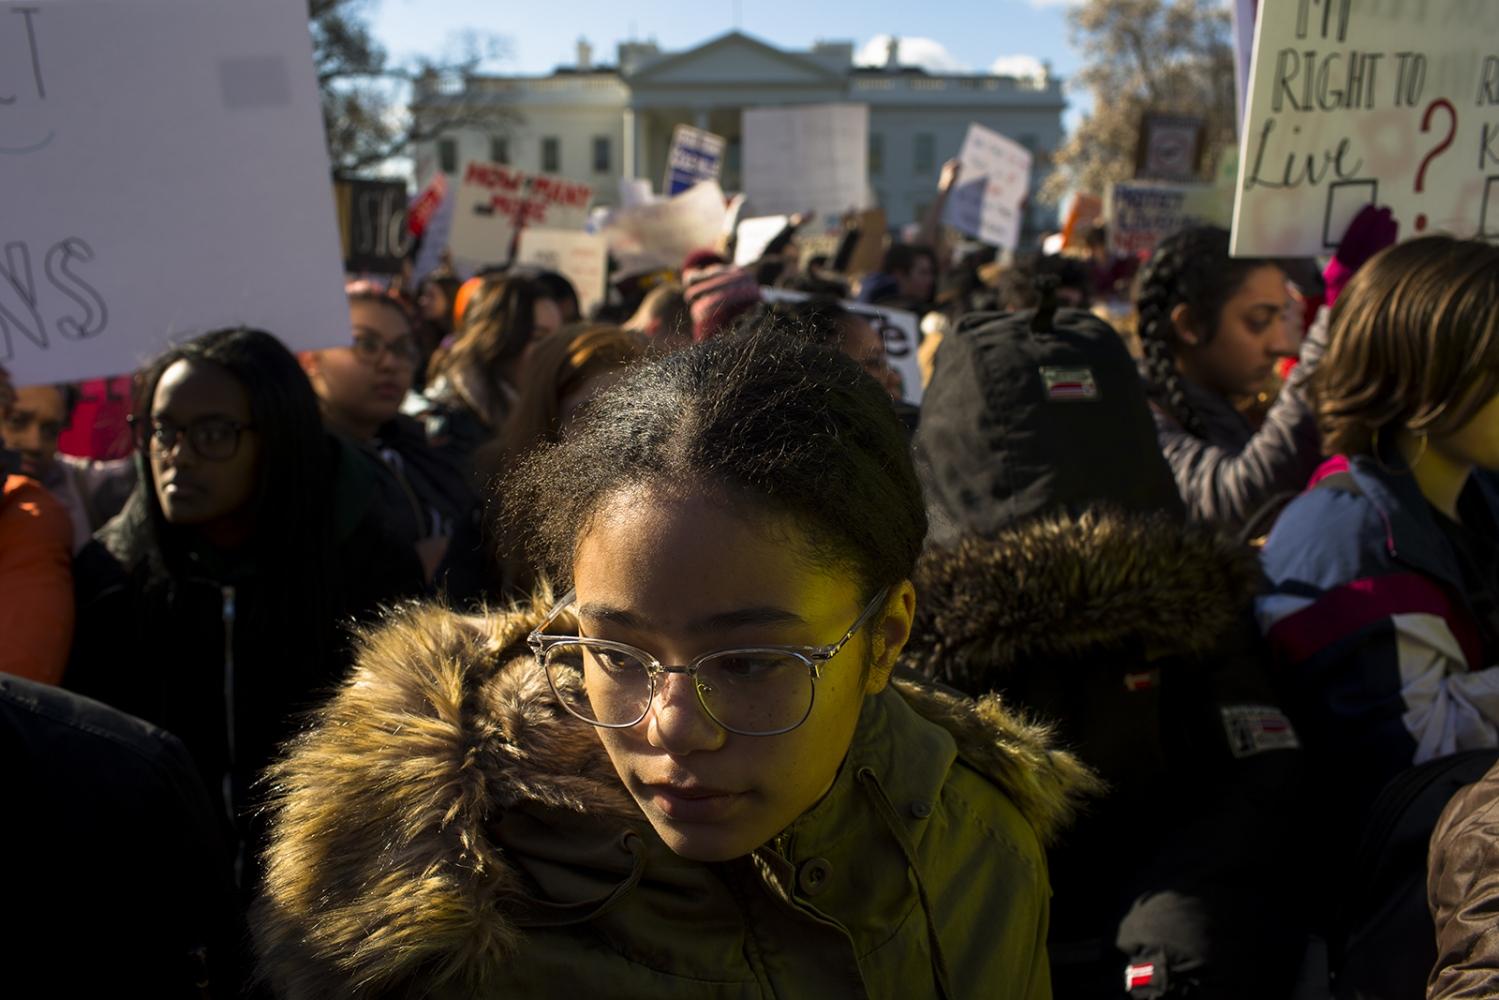 Sofia Nuri observes the 17 minutes of silence for the students killed atMarjory Stoneman Douglas High School.